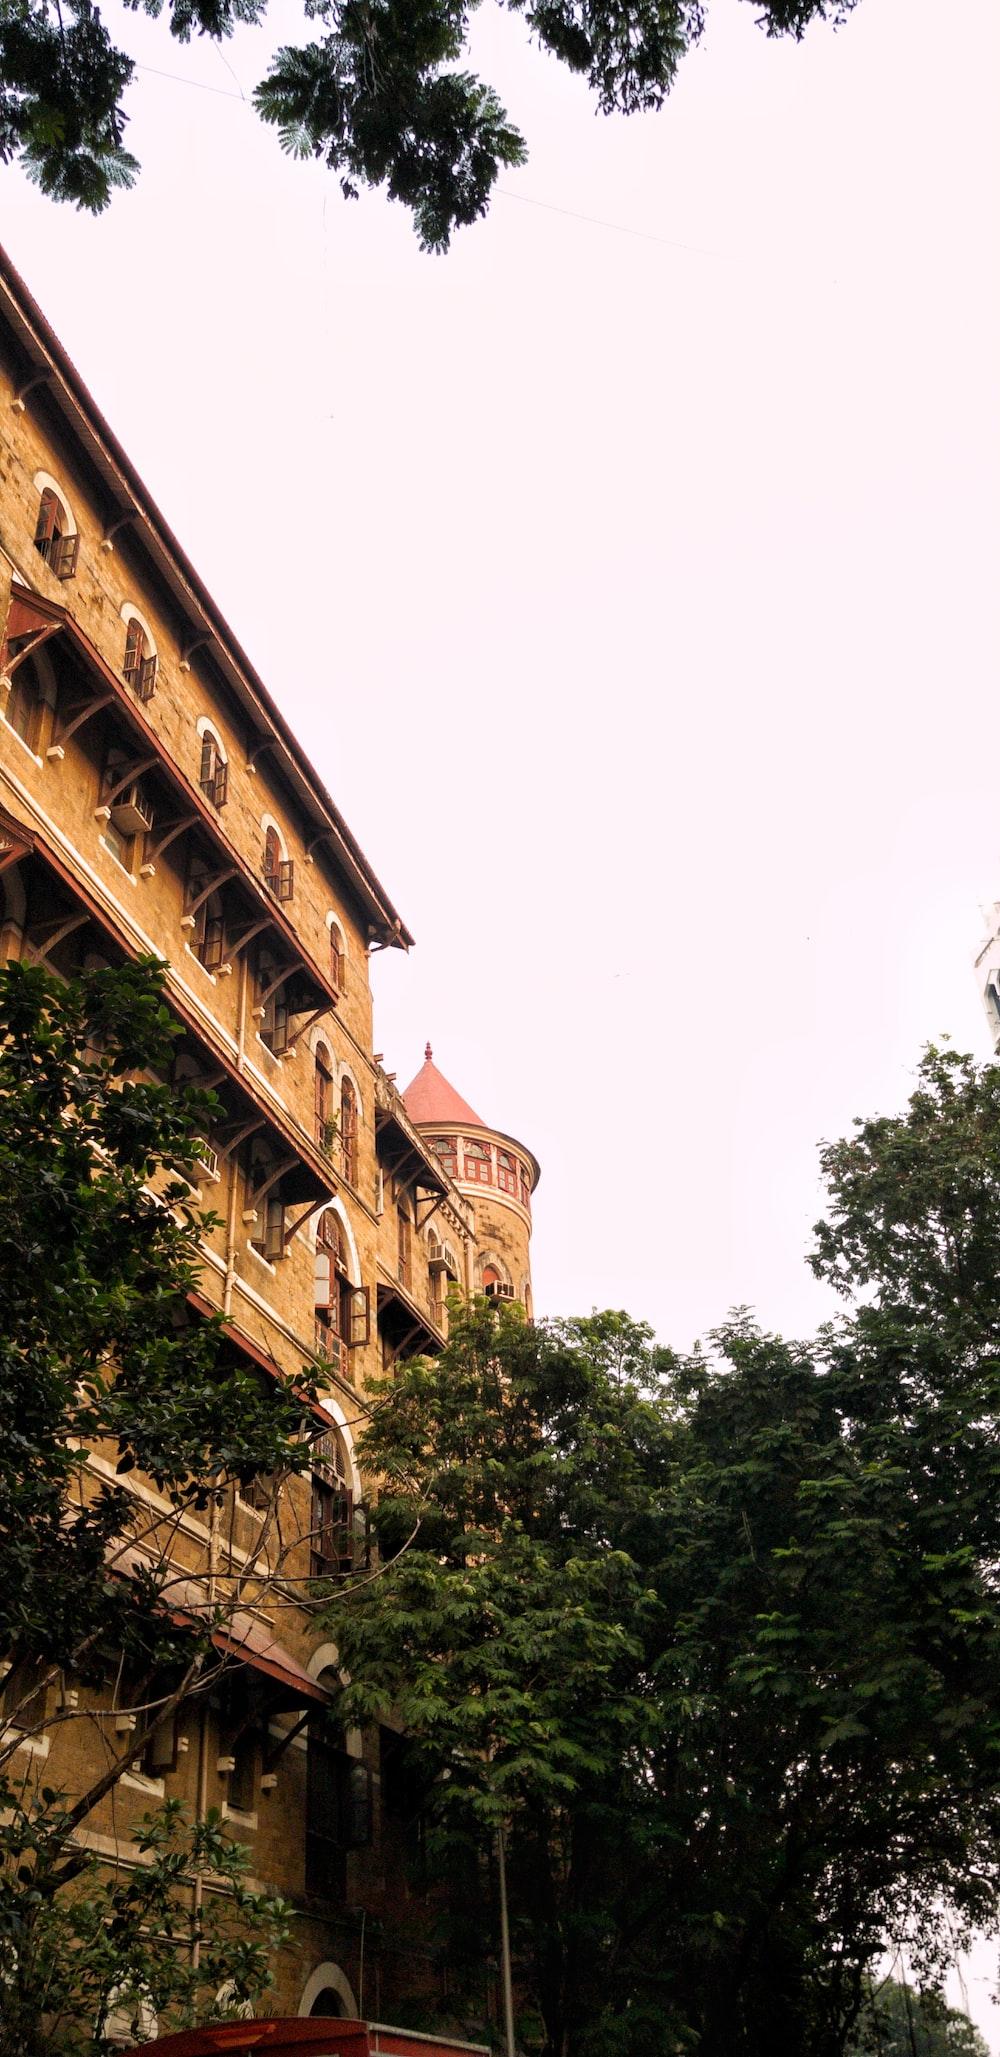 beige high-rise buidling